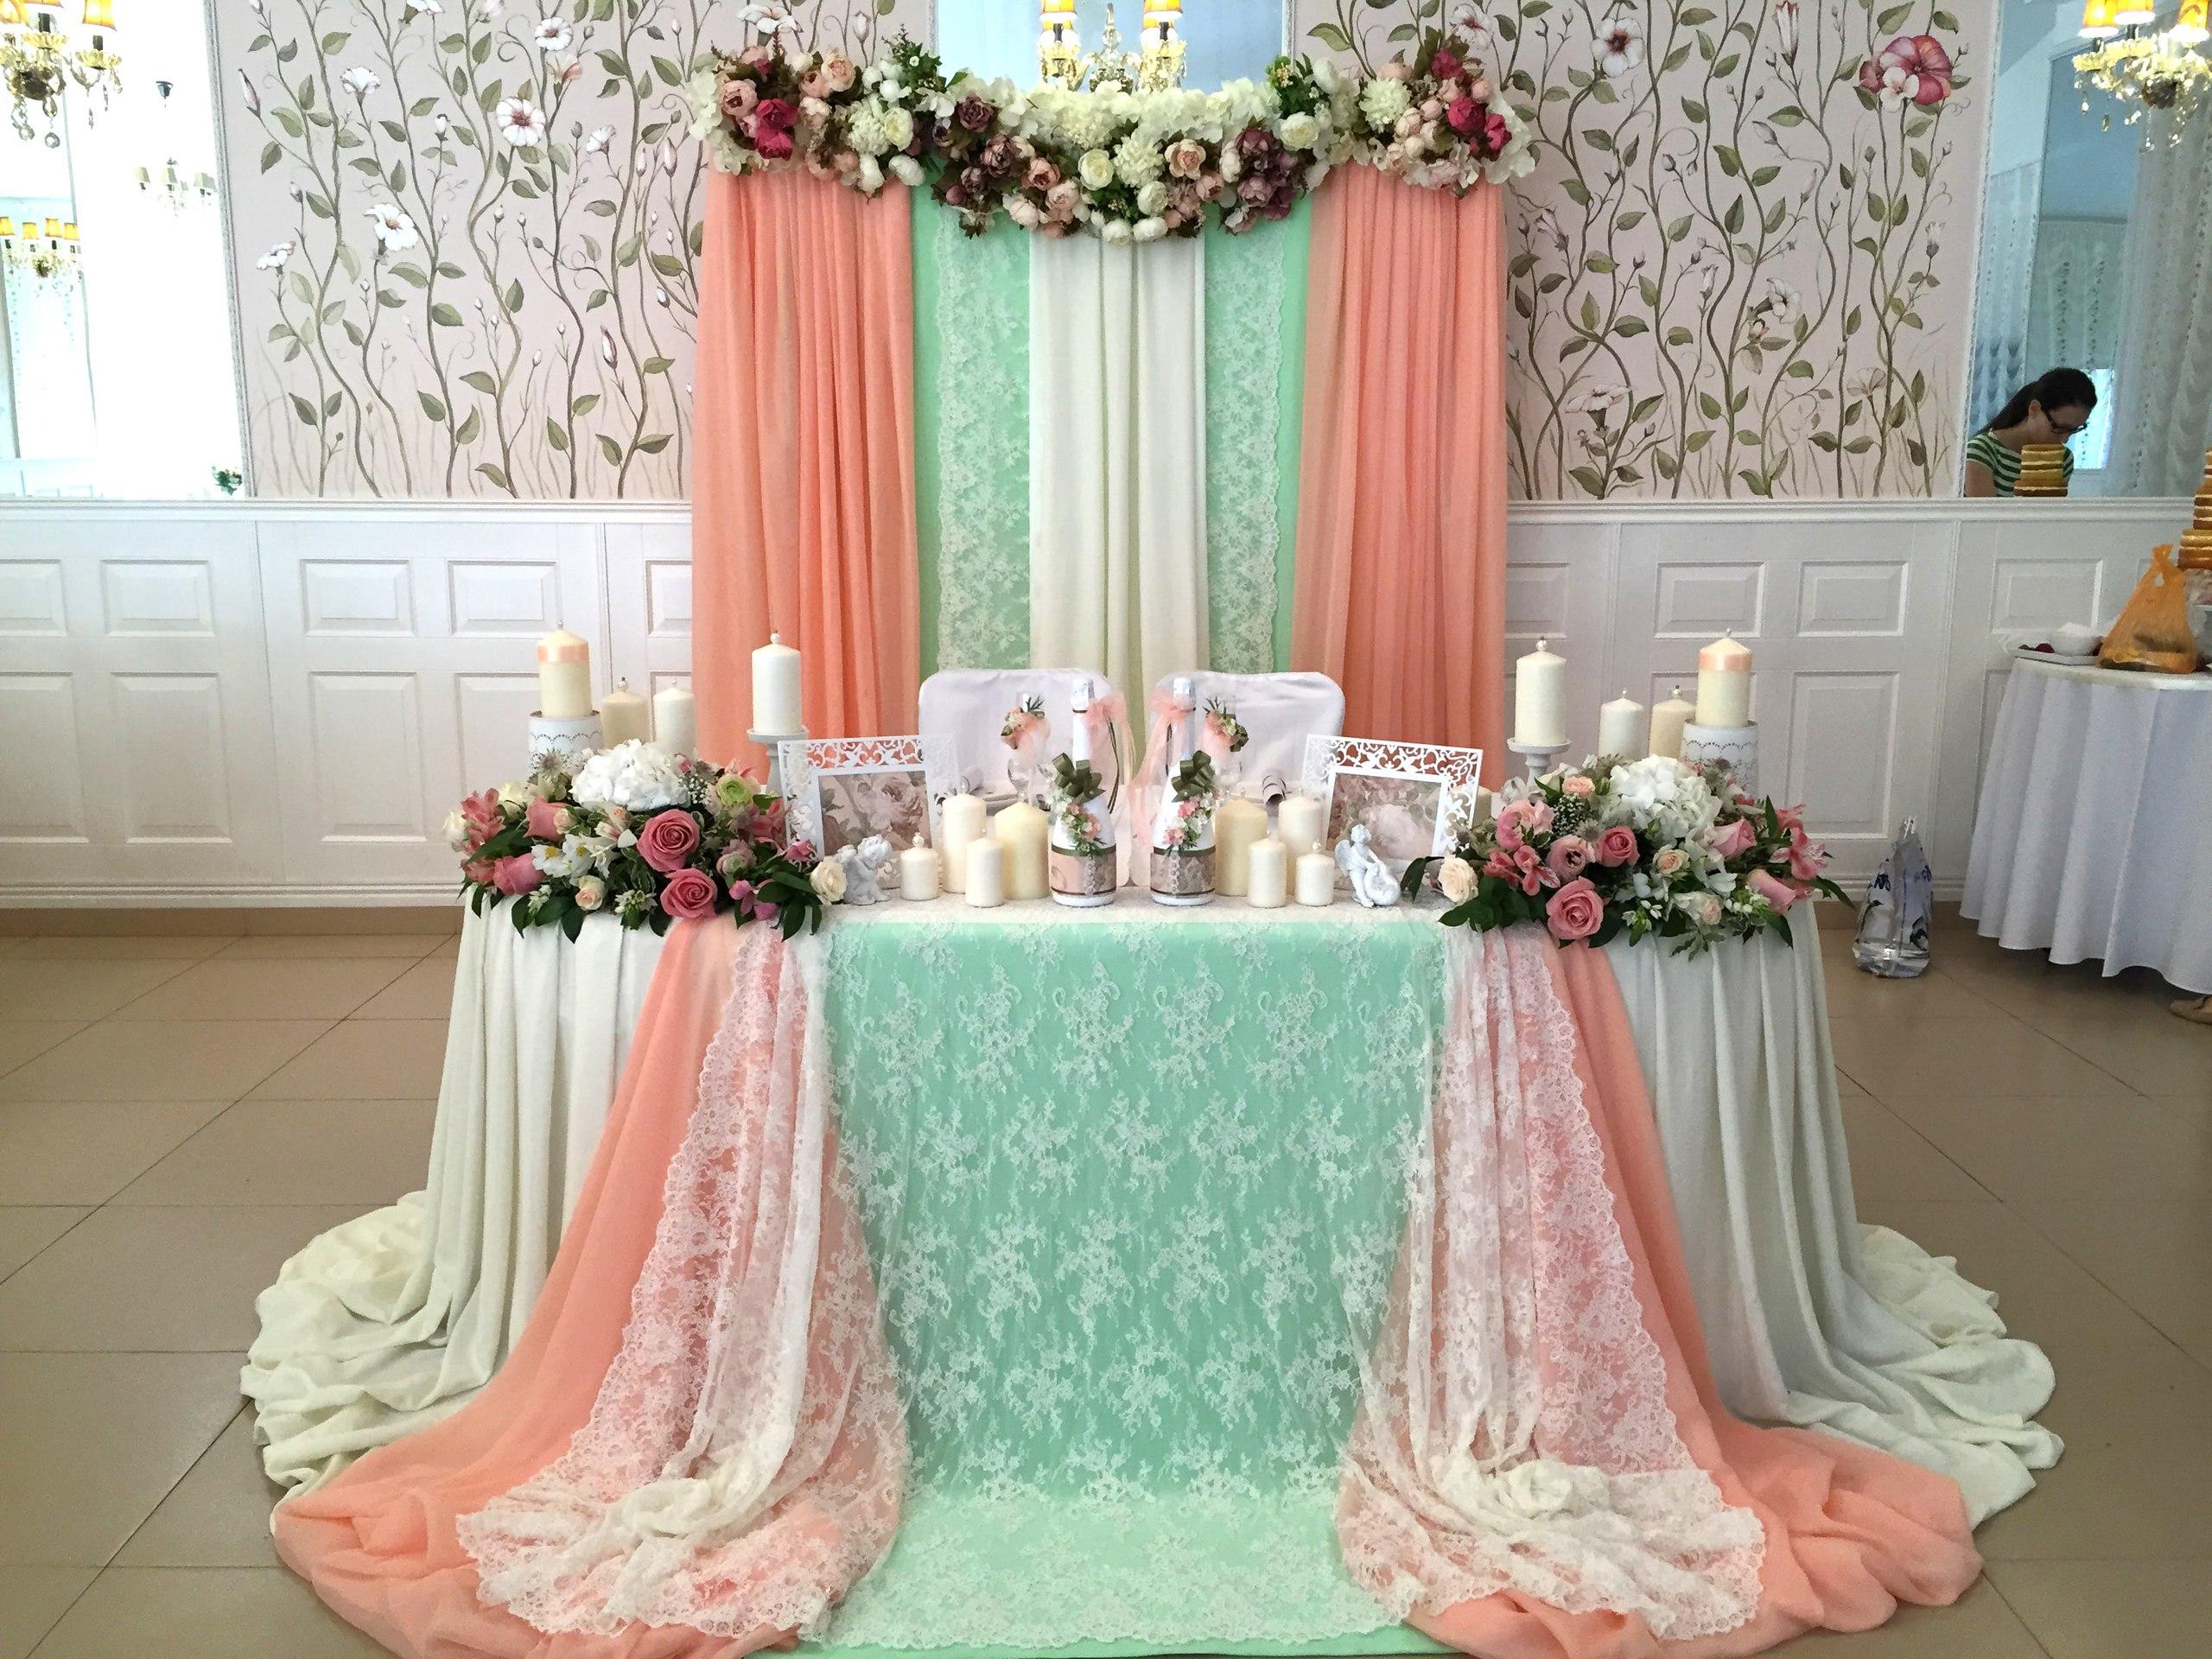 yPH8RAgXvgI - Правила декорирования столов на свадьбе